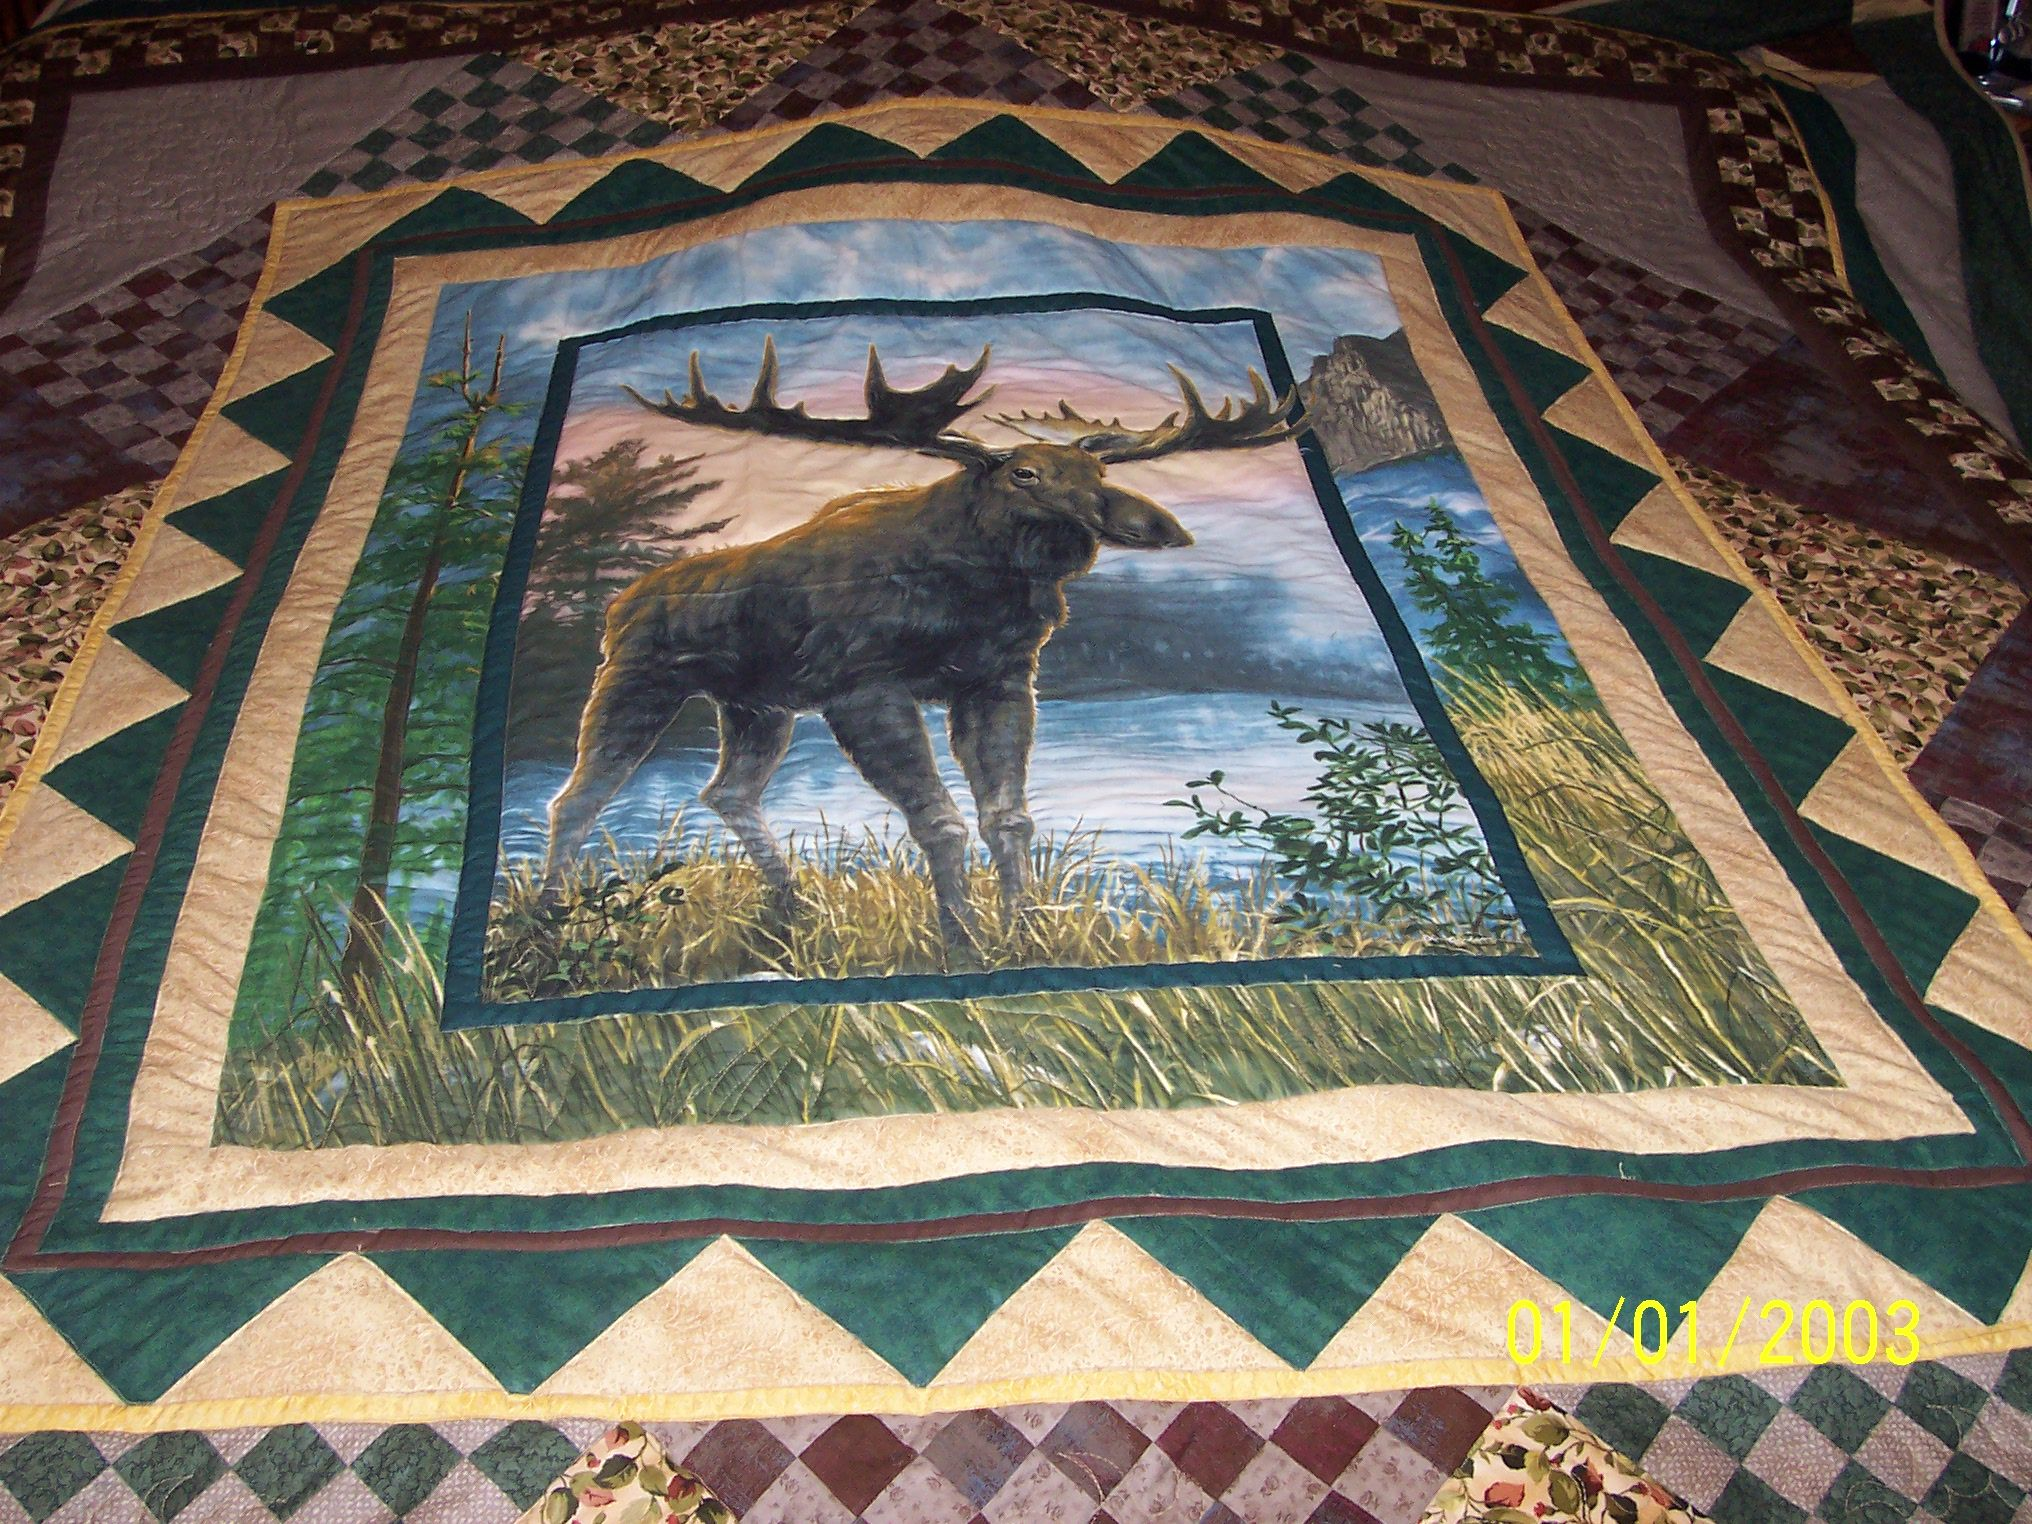 King Size Moose Quilt | Quilts | Pinterest | Moose quilt, King ... : moose quilt - Adamdwight.com